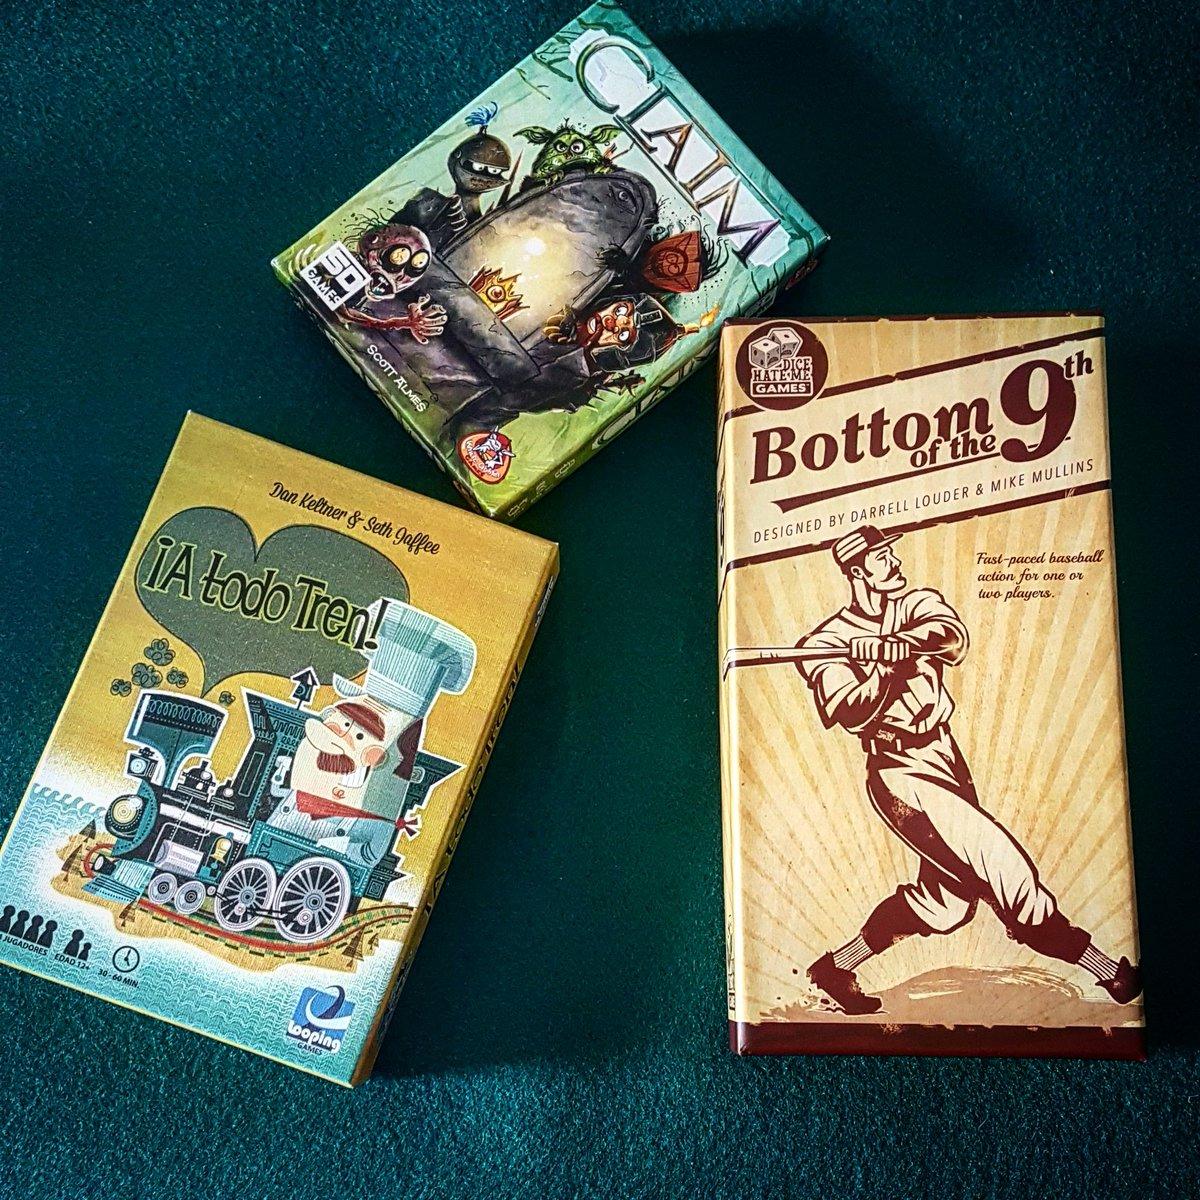 #BoardGames #TabletopGames Selección matutina para terrazeo extremo. #Brettspiel #JeuxDeSociete #JogoDeTabuleiro #GiocoDaTavolo #JocDeTaula #JuegosDeMesa #BoardGameGeek #bgg #BoardgamesOfInstagram #BoardgamePhotography #BoardGamers #reseña #review #boardgamesofinstagram